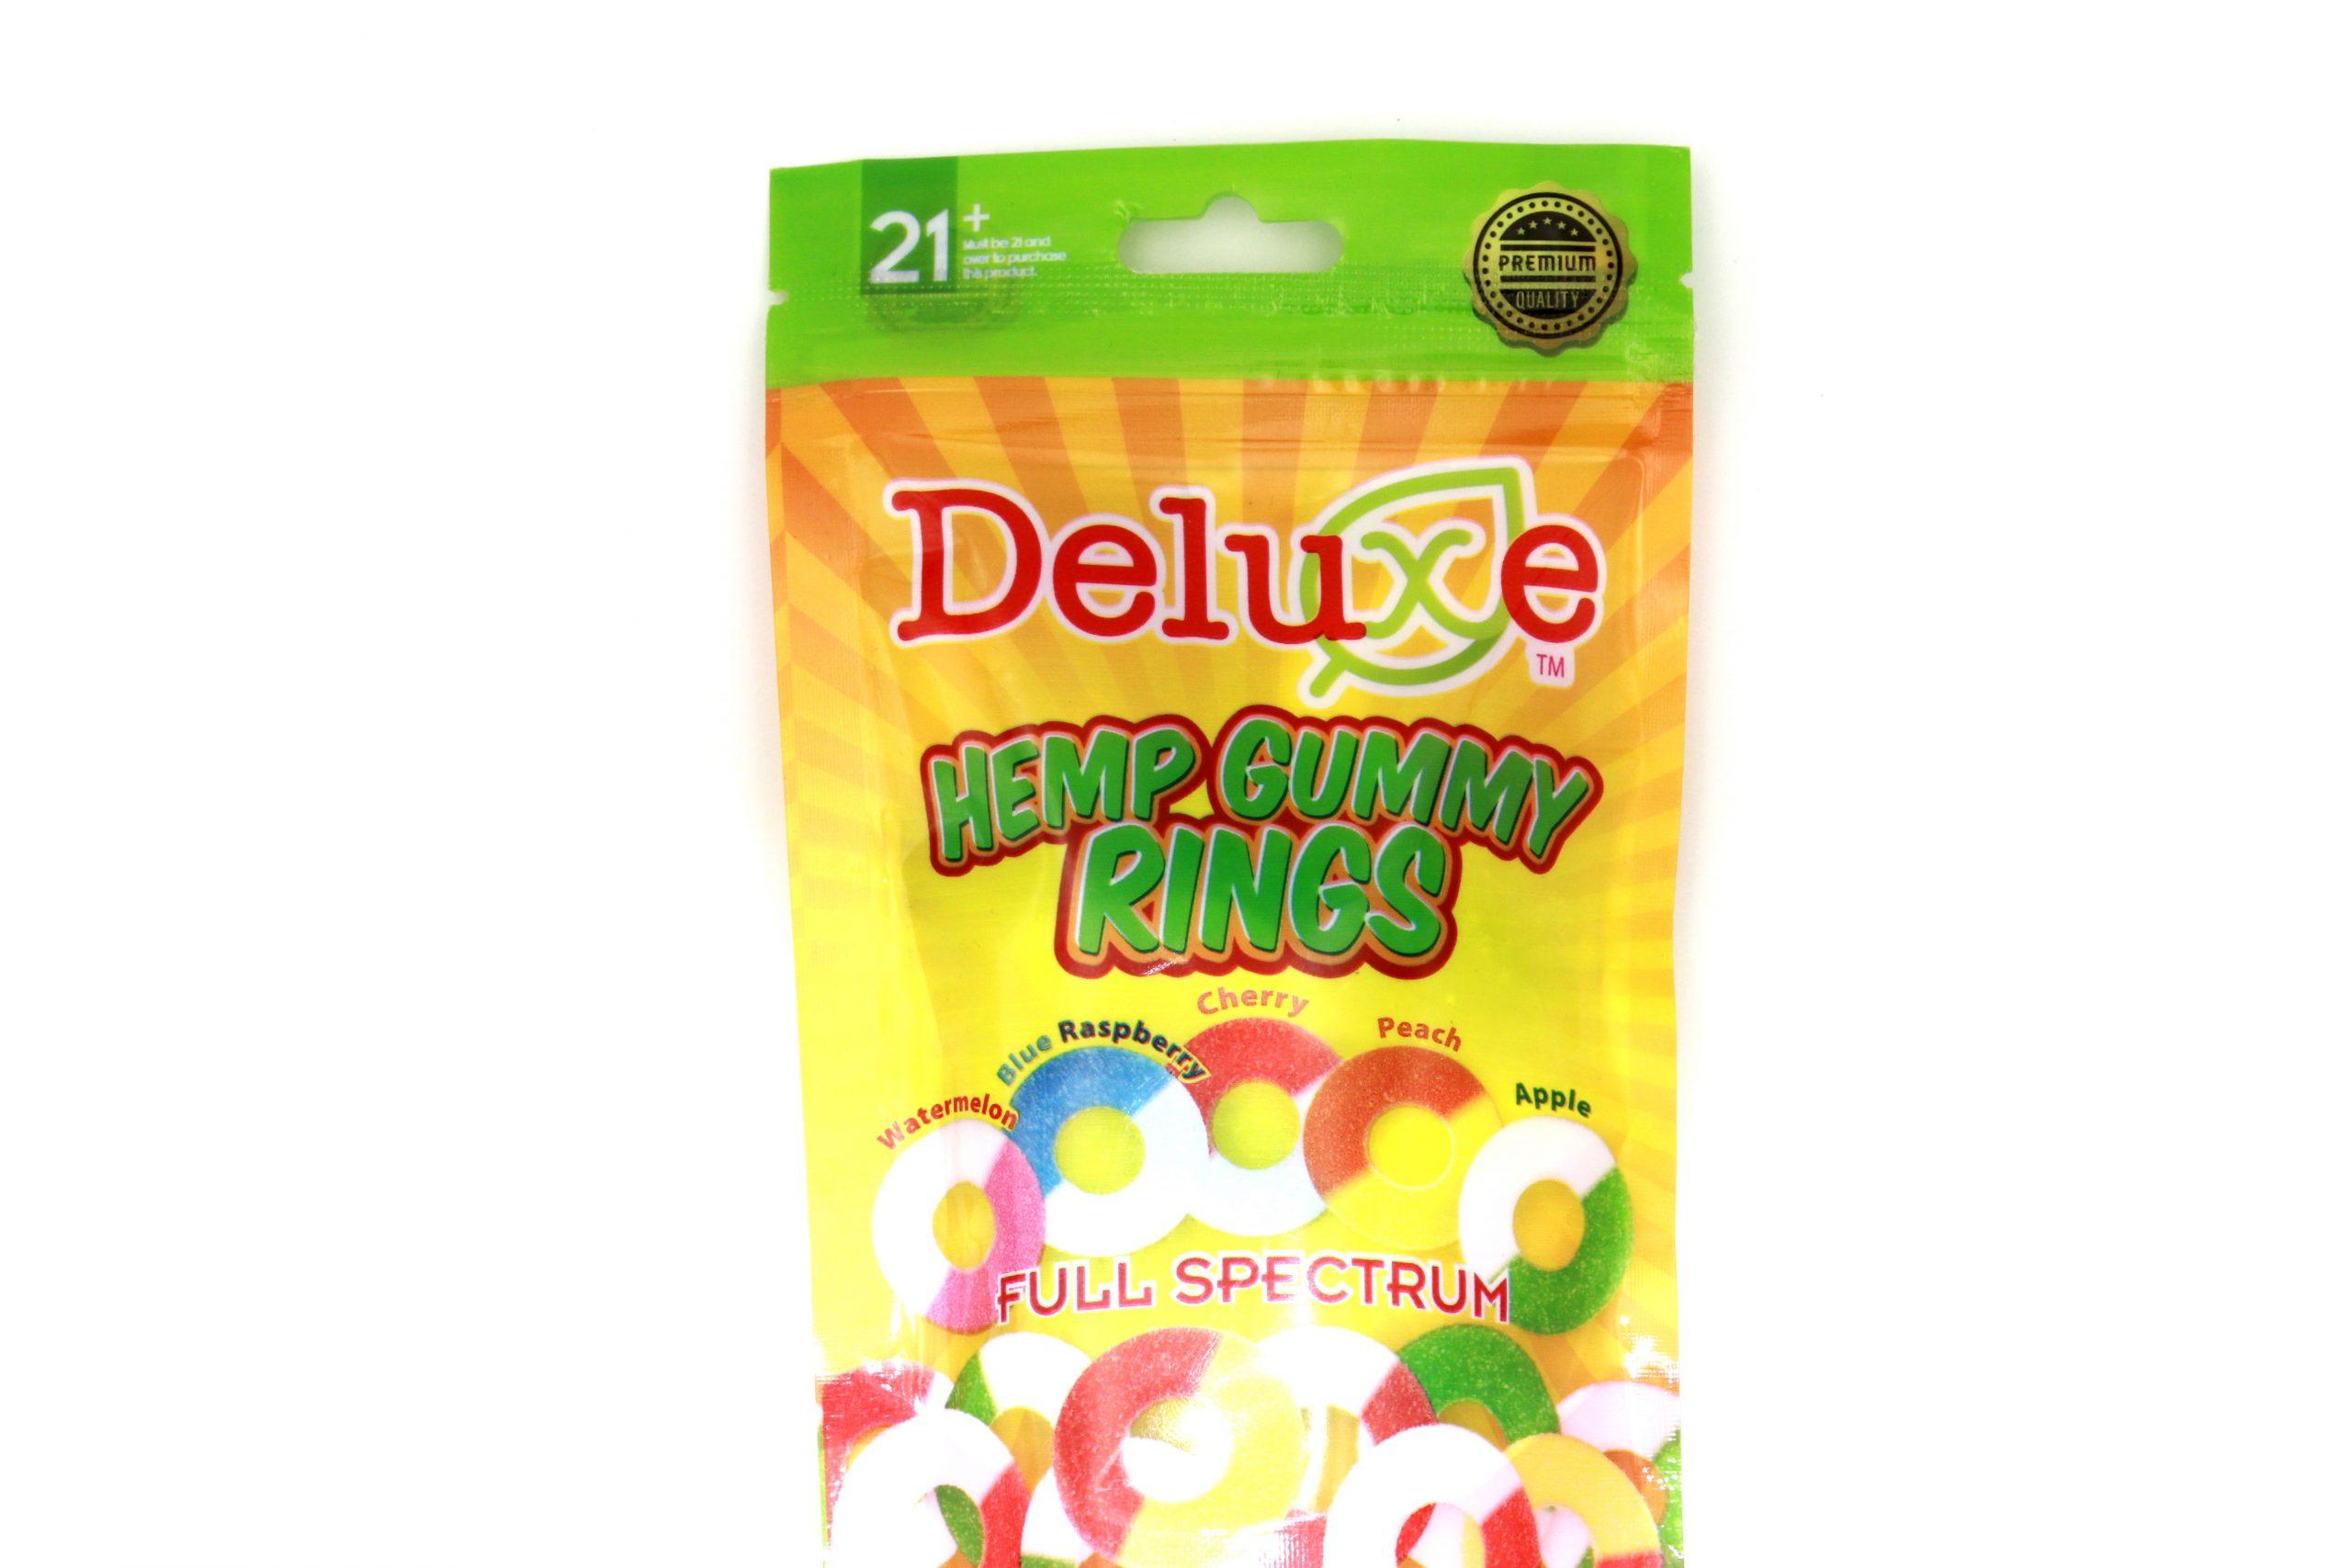 DELUXE CBD HEMP GUMMY RINGS- SWEET